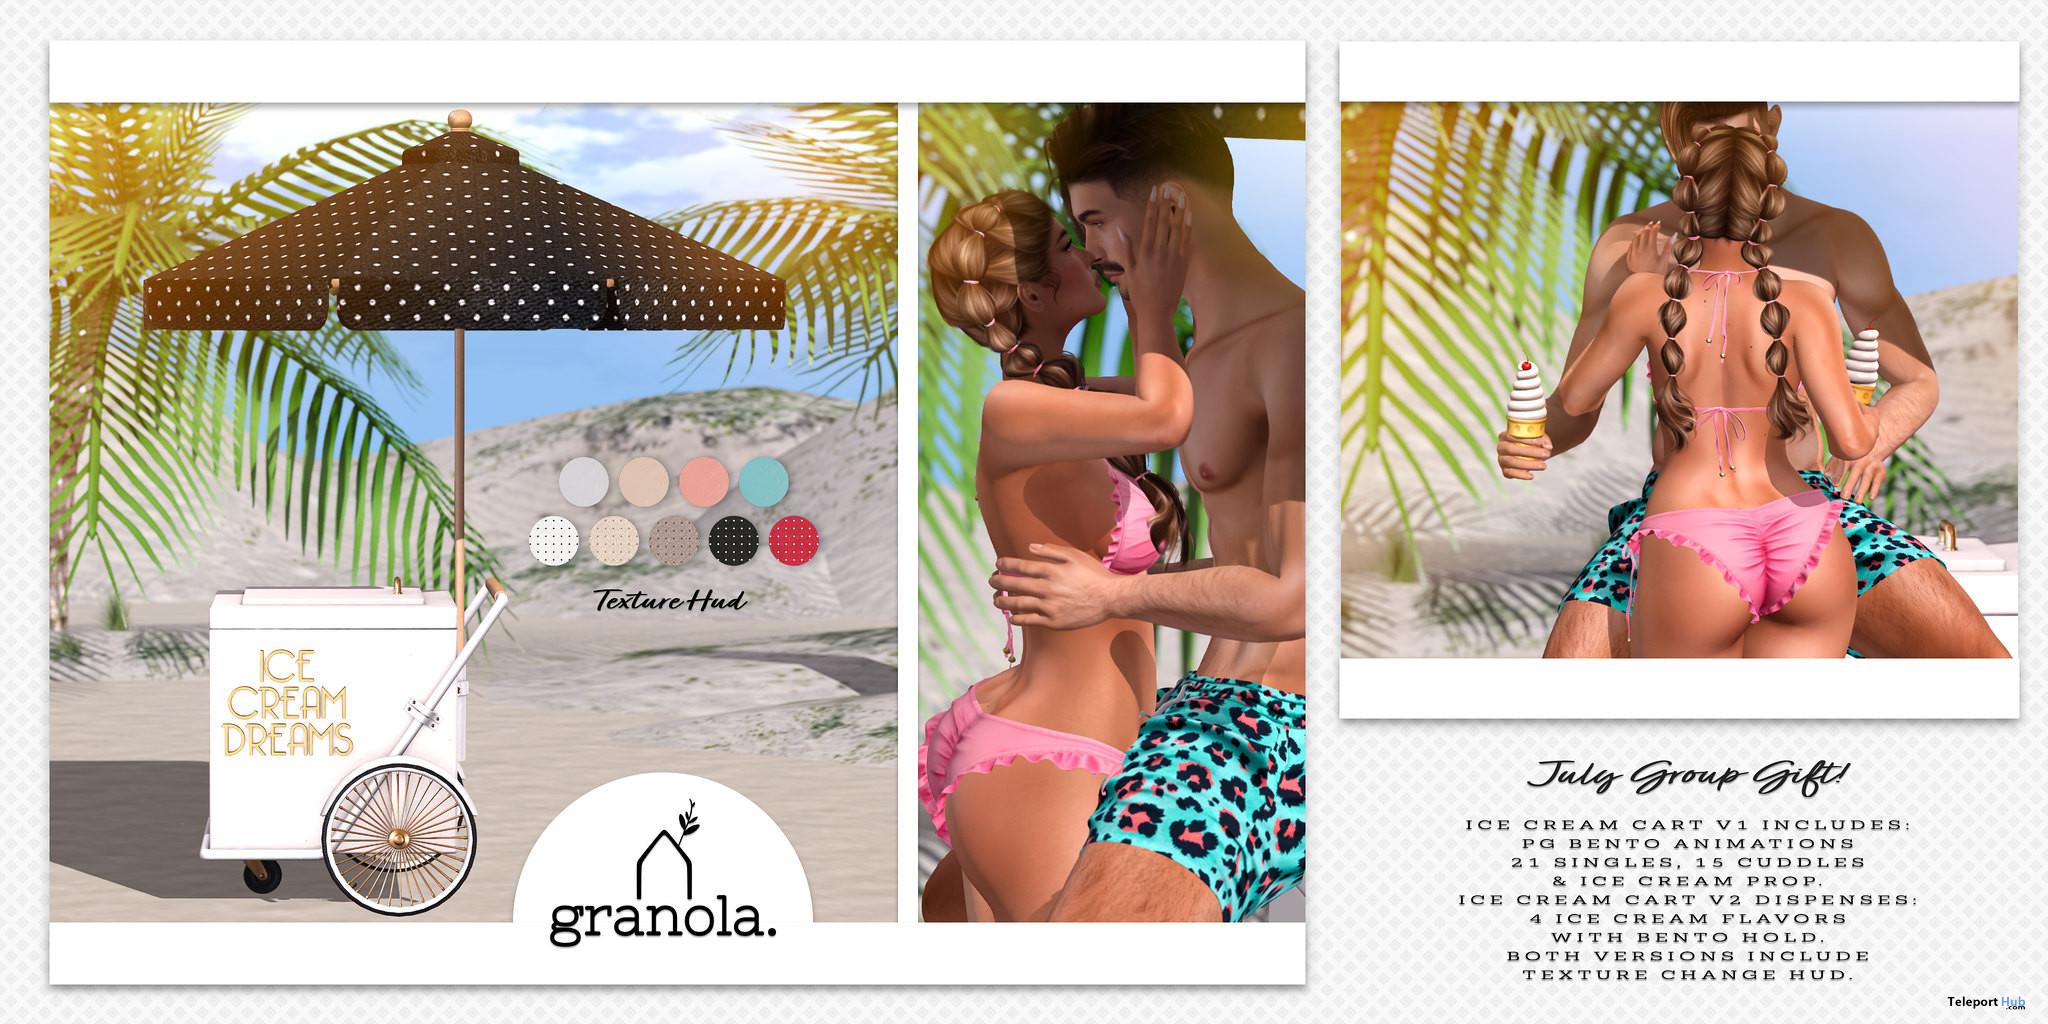 Ice Cream Cart V1 July 2021 Group Gift by Granola - Teleport Hub - teleporthub.com